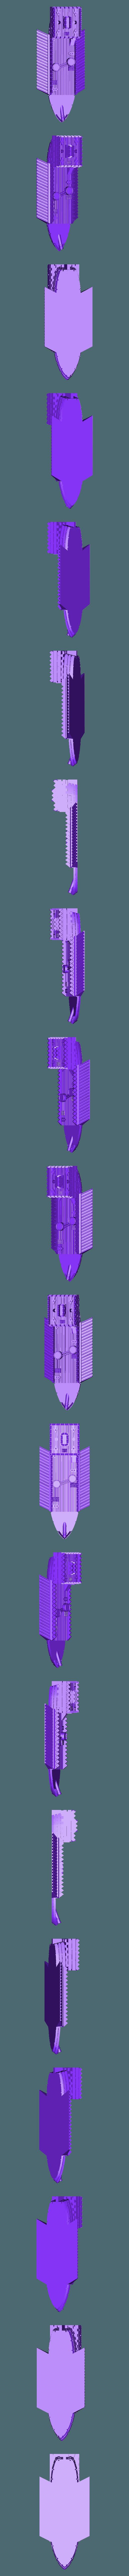 LordGonamCommandShipPart.stl Download free STL file GONAM Lord GONAM Command Ship proxy • 3D printer design, barnEbiss2